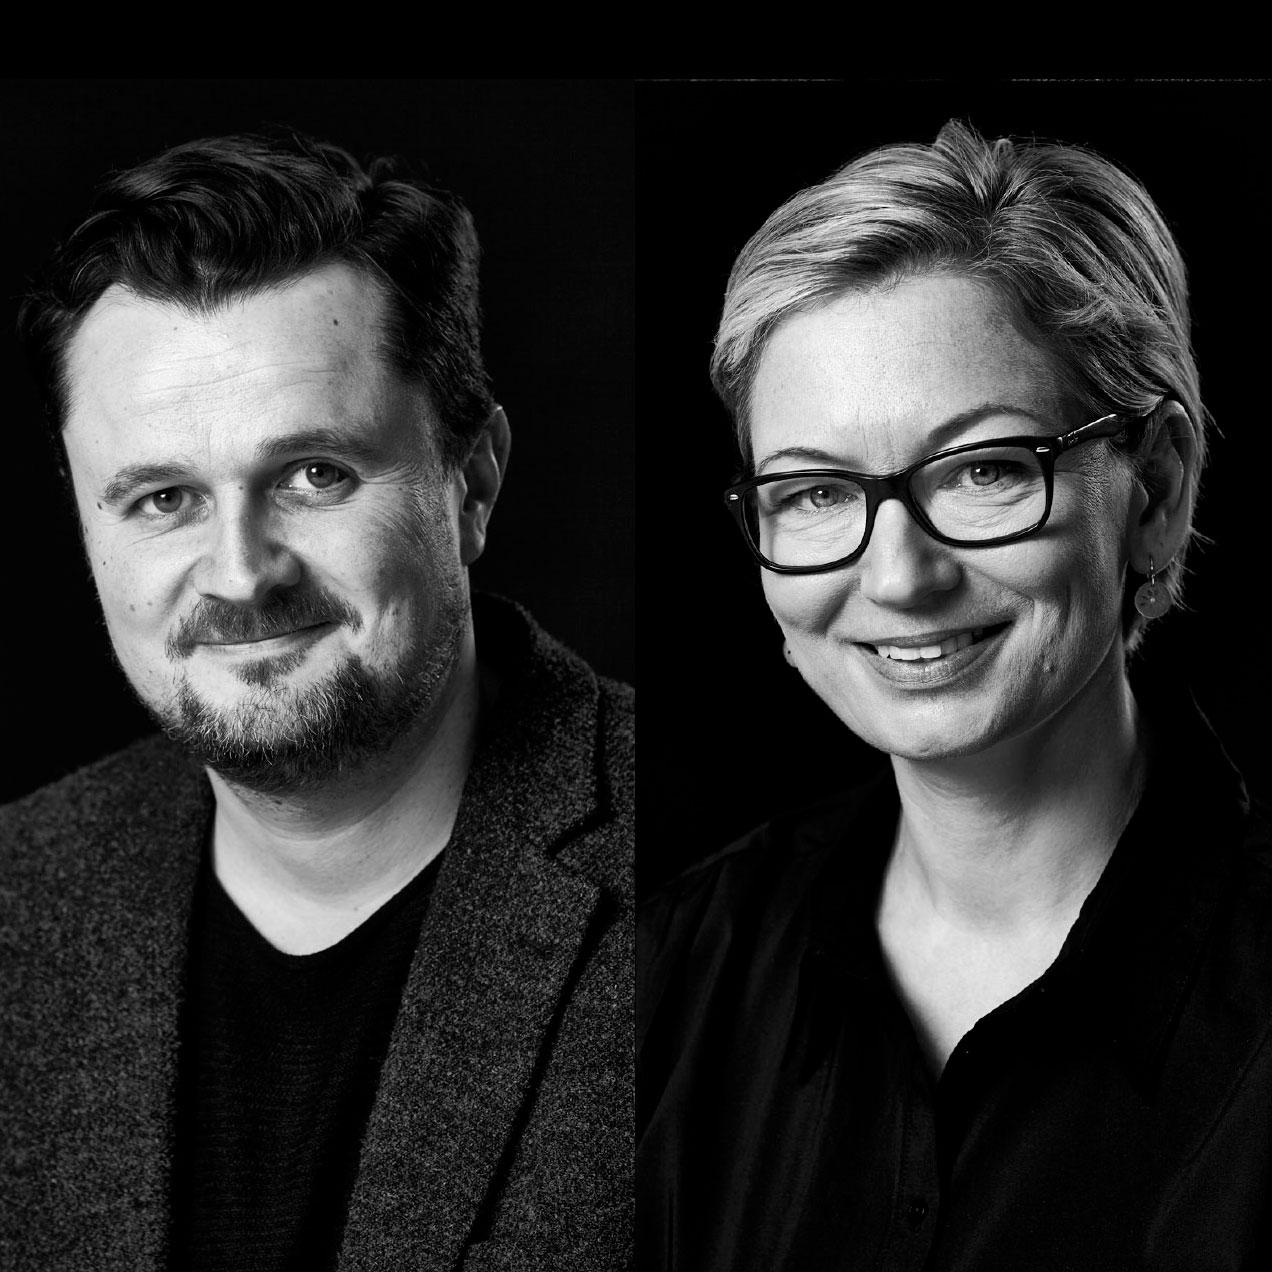 Jakob Brodersen & Pernille Engsig Eskildsen